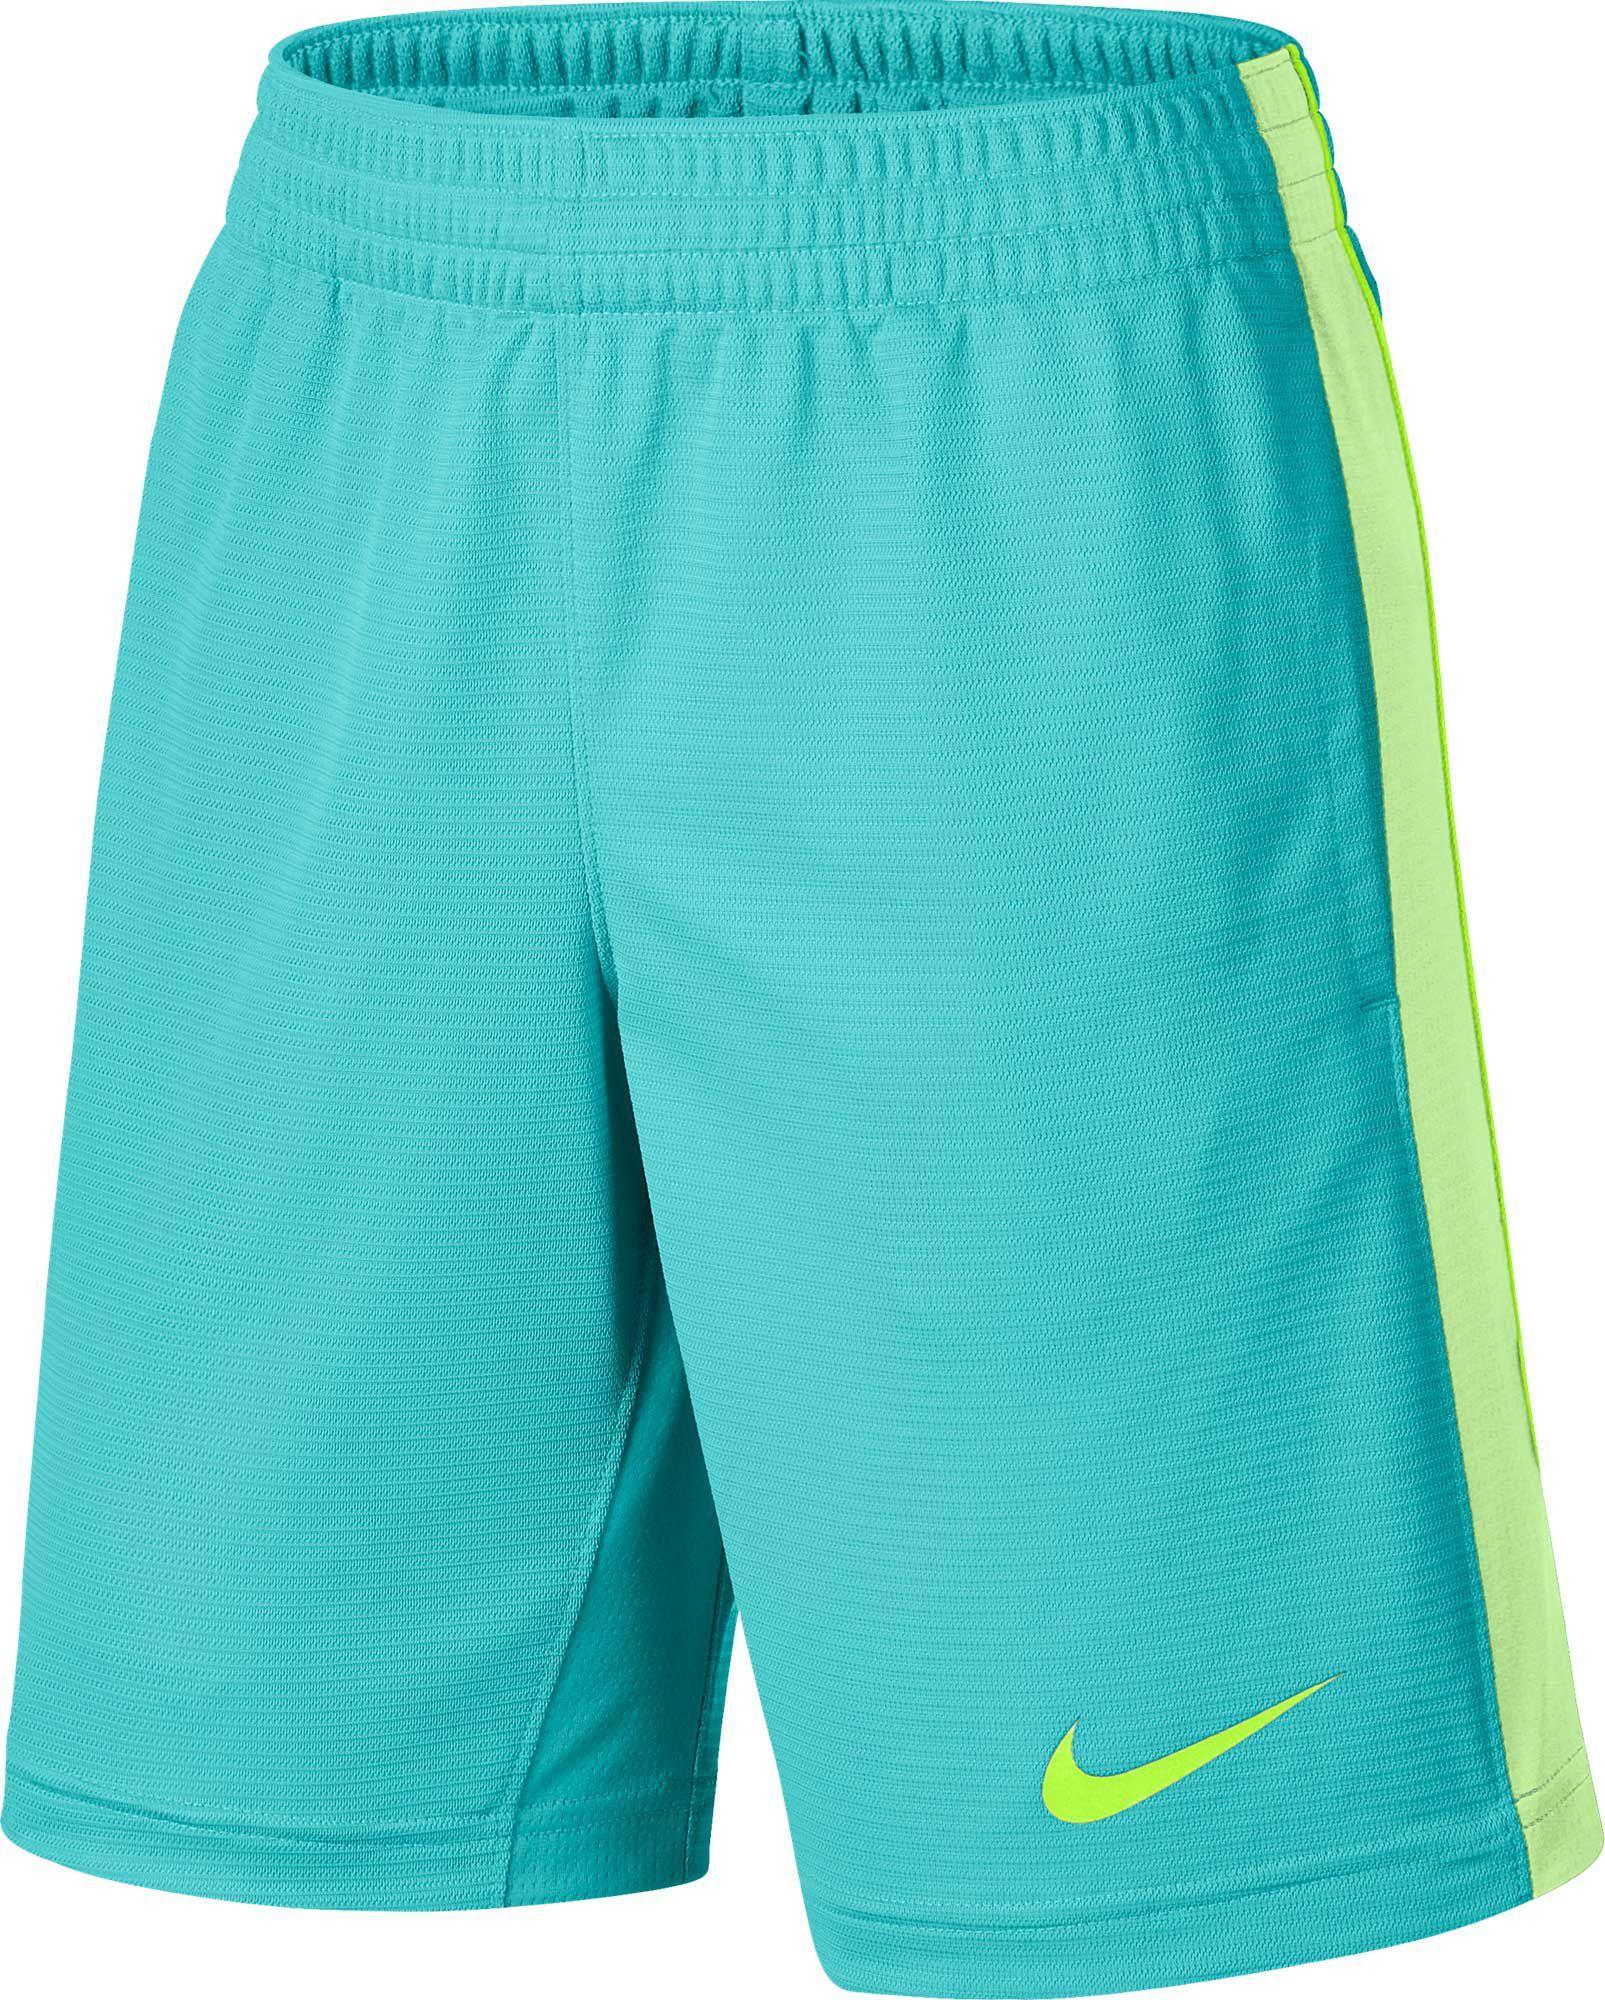 nike shorts near me